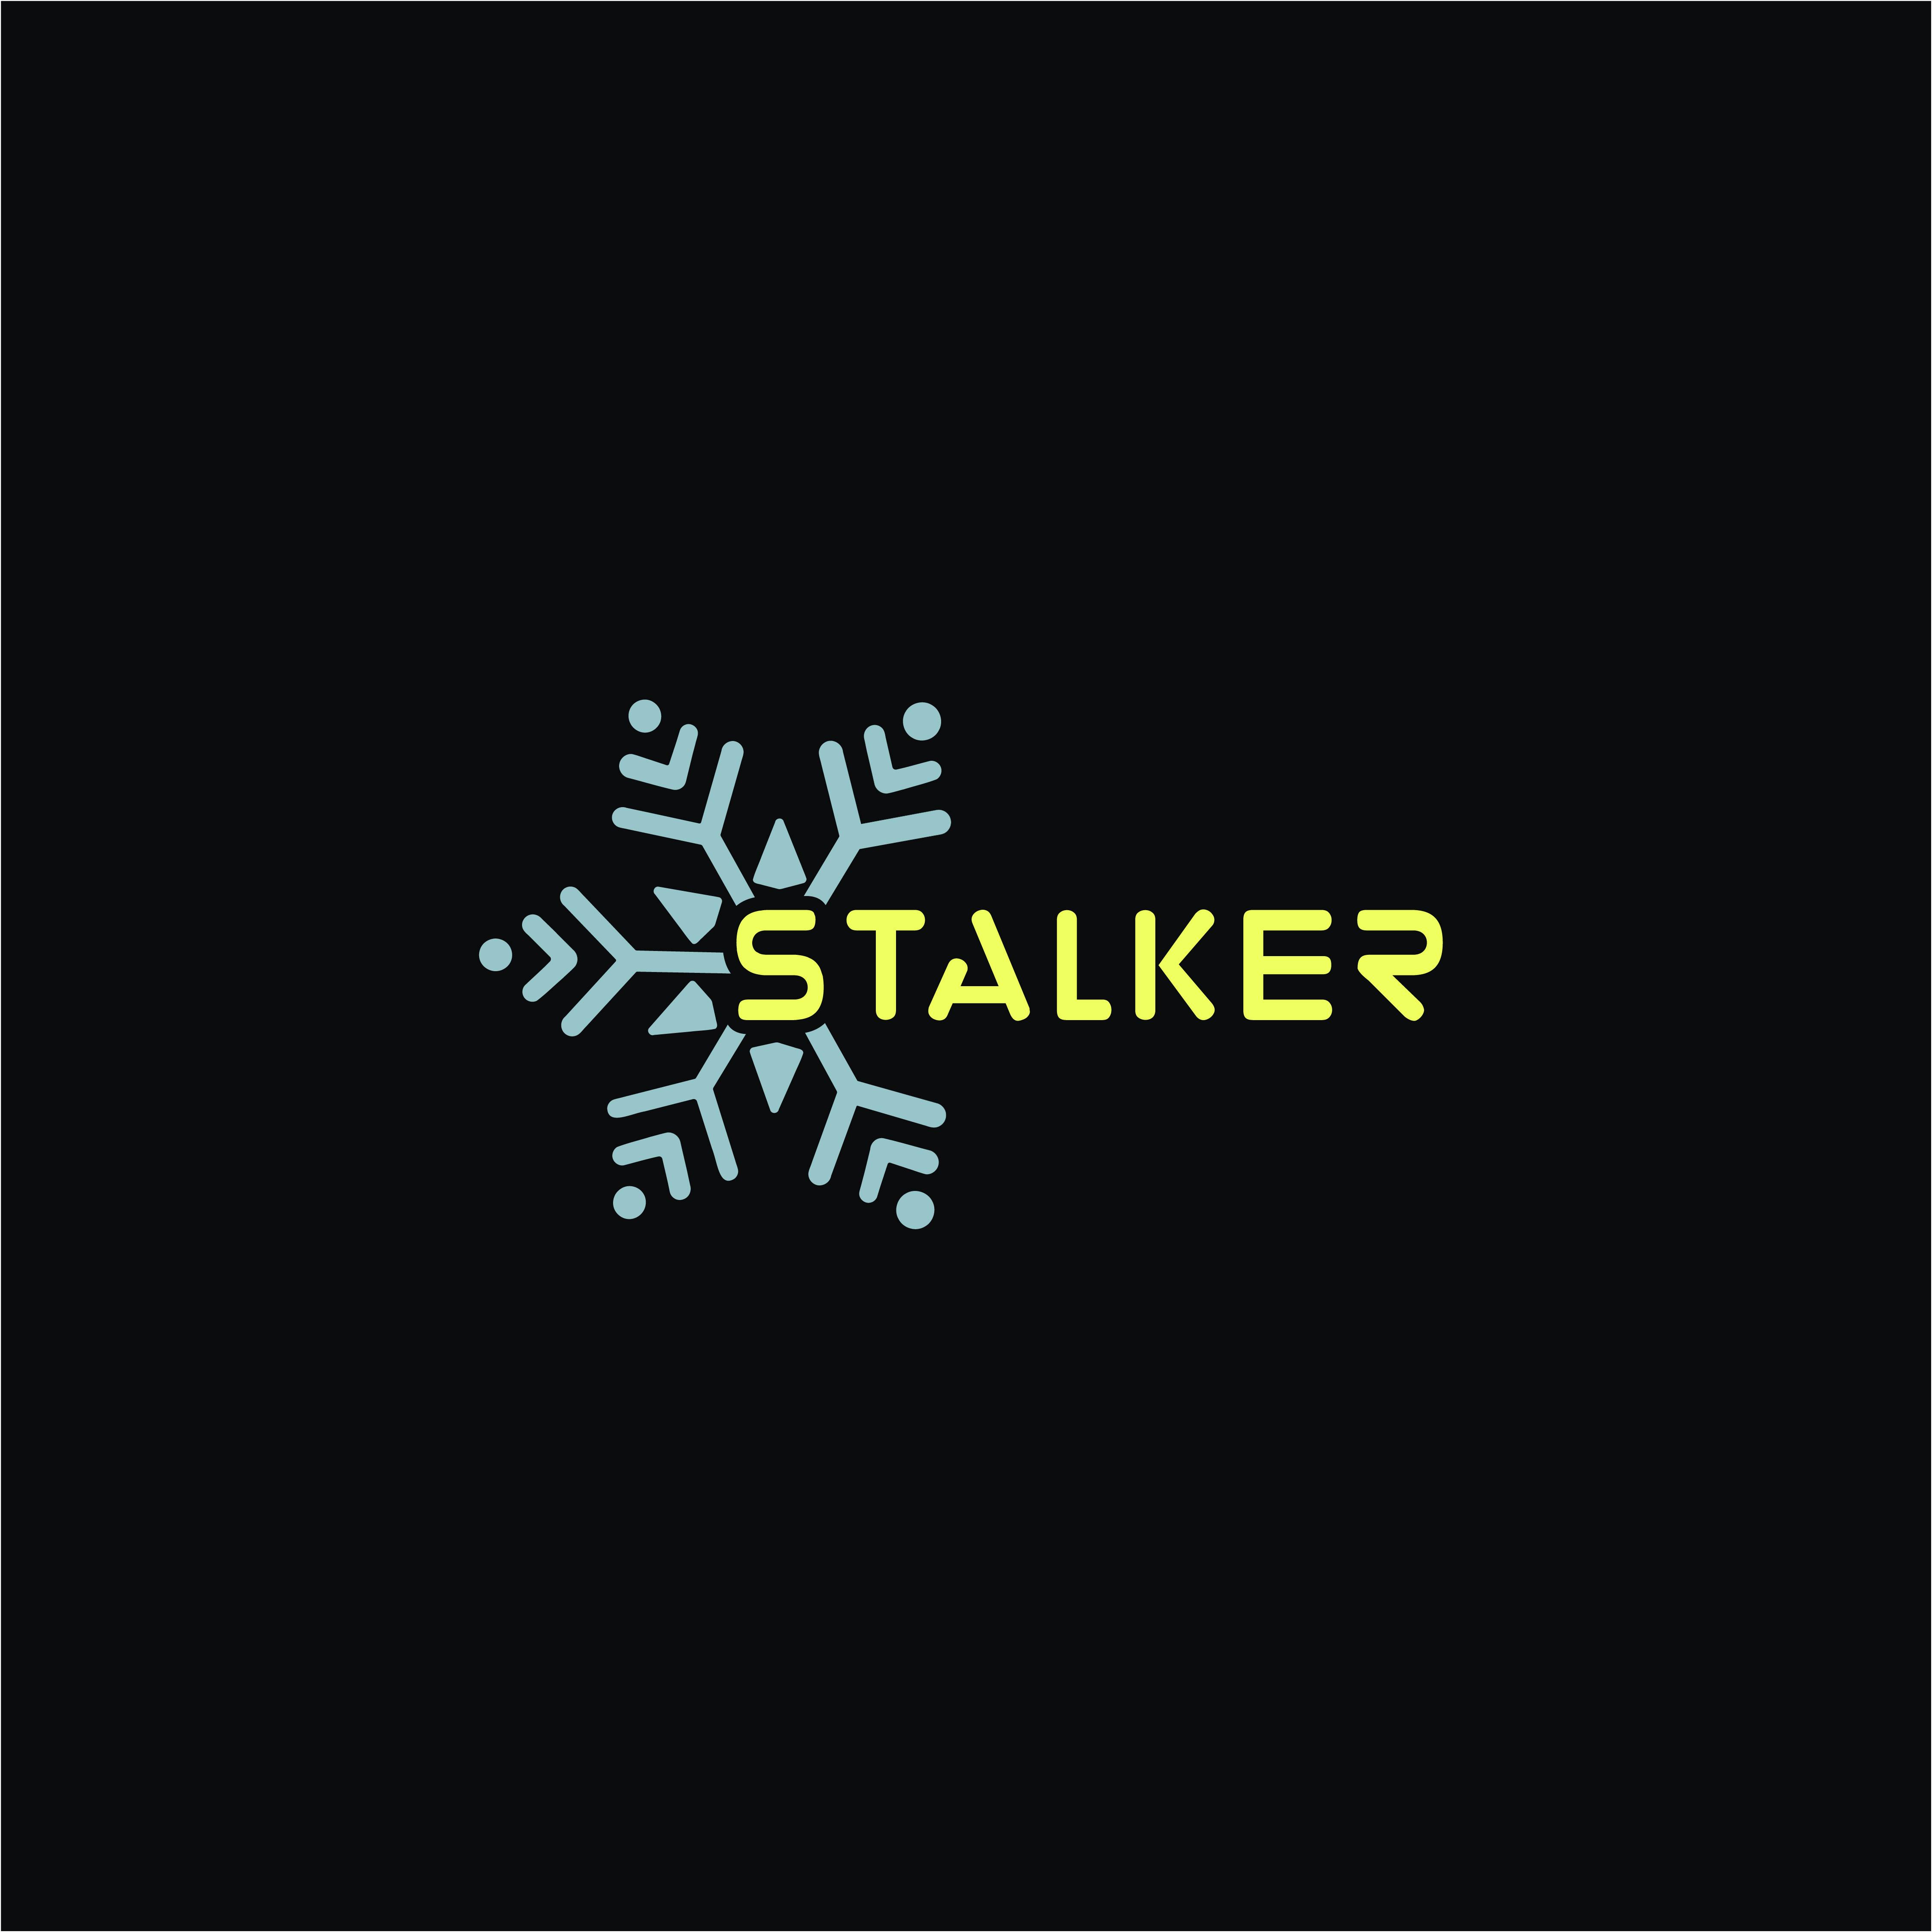 Разработать логотип для вездехода фото f_3015f8ef9aad41f6.jpg